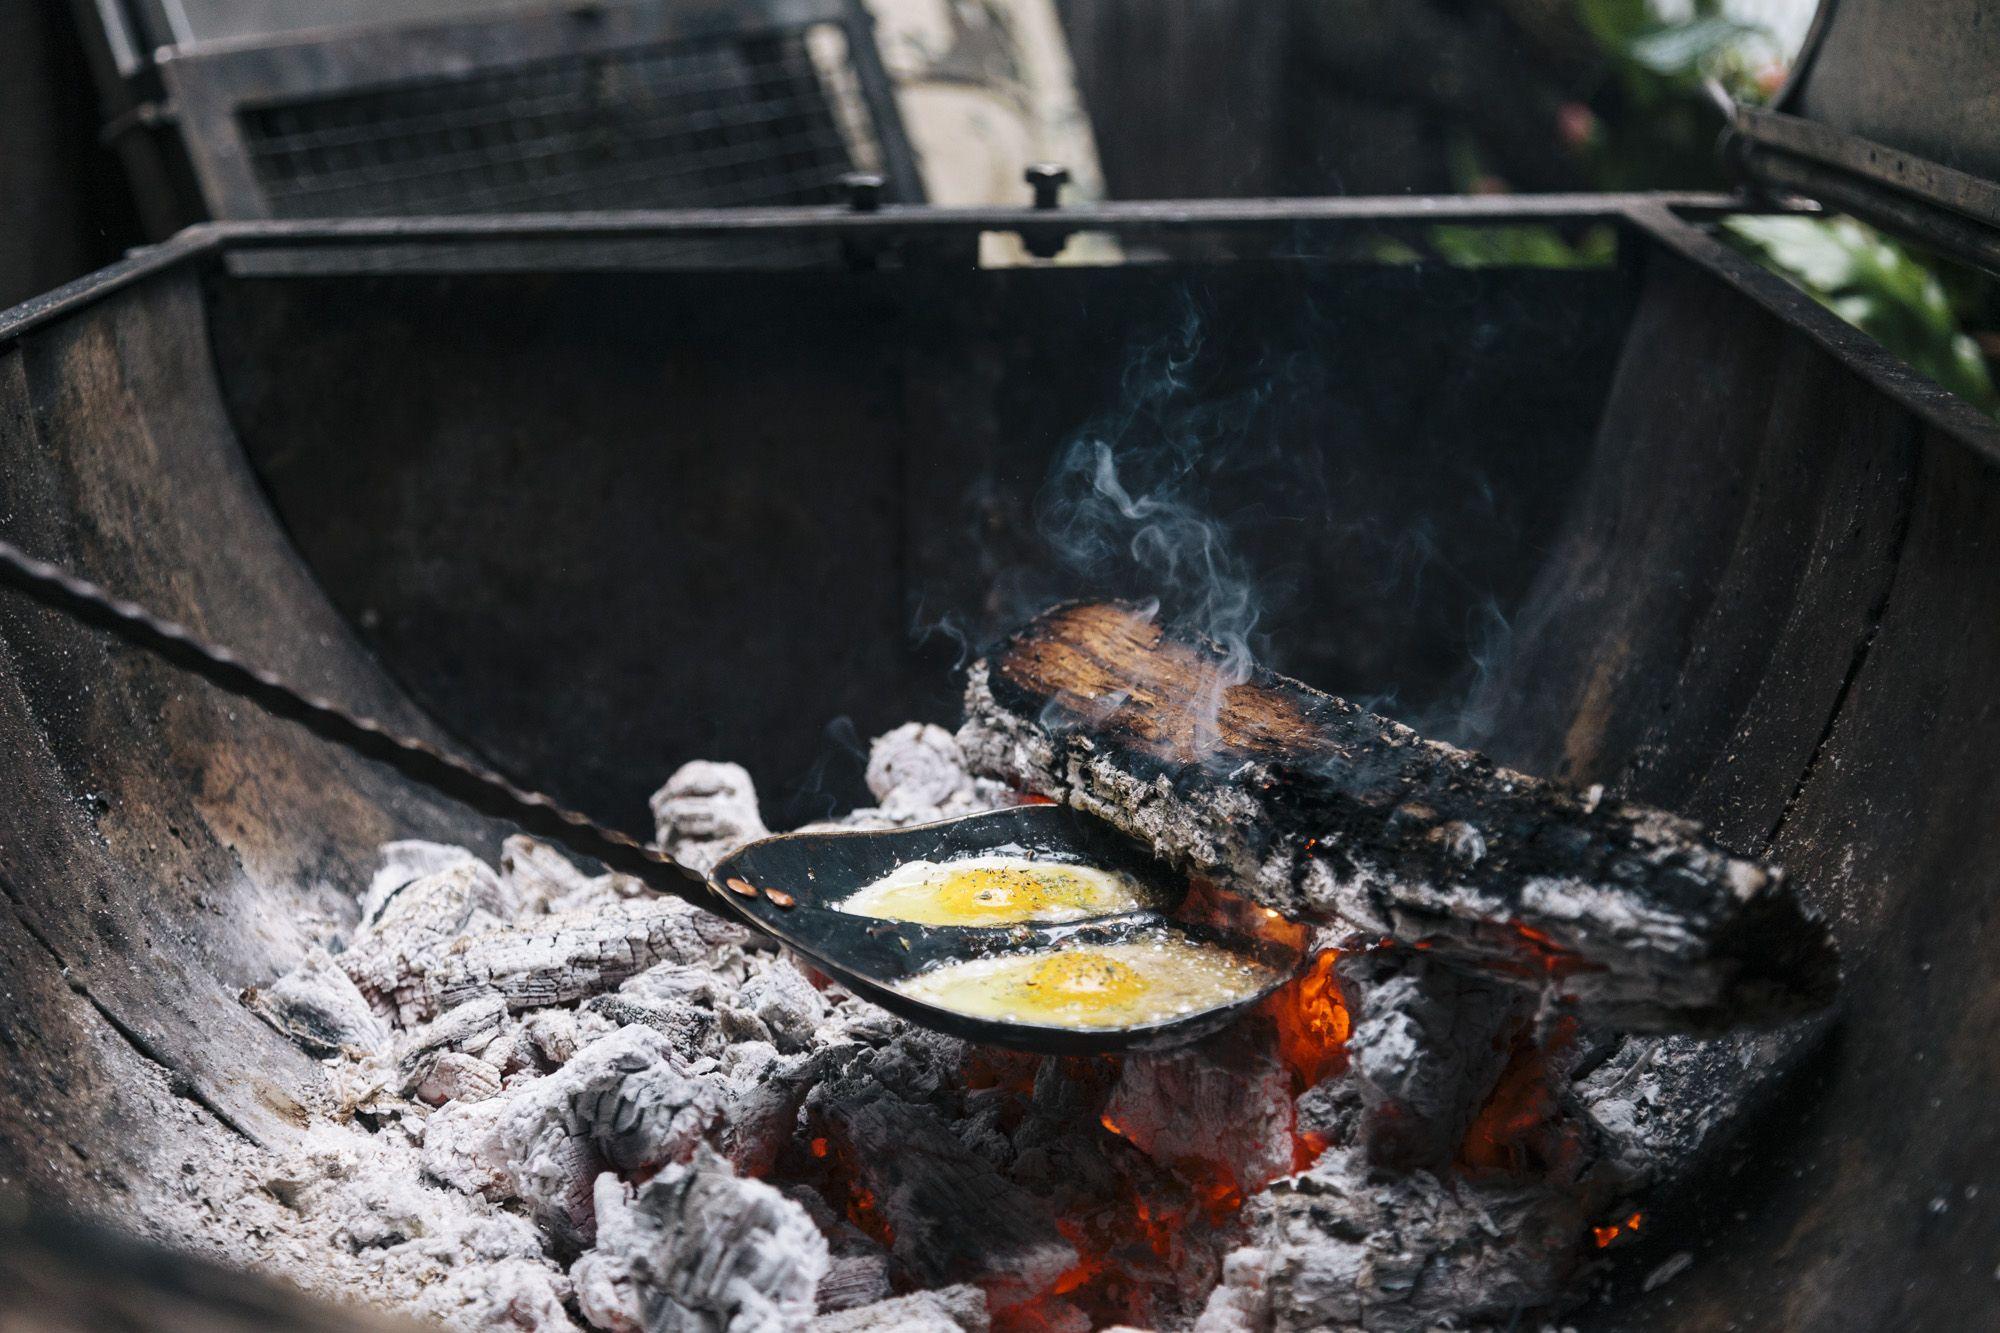 Angelo garro chef blacksmith and owner of renaissance